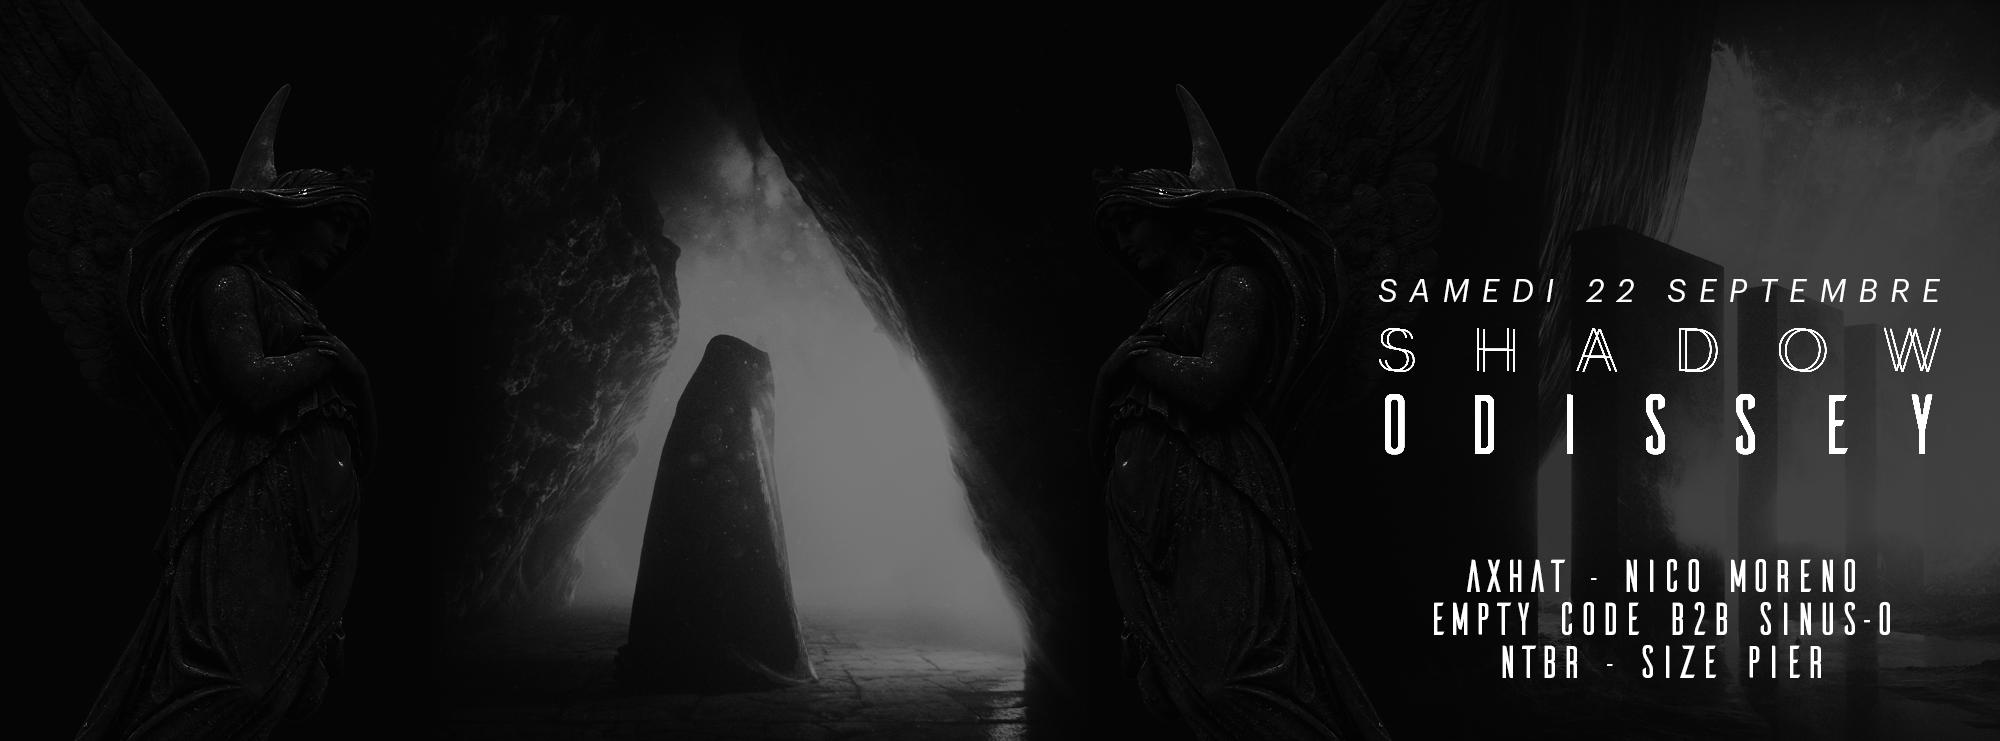 SHADOW ODISSEY - La messe de l'ombre II